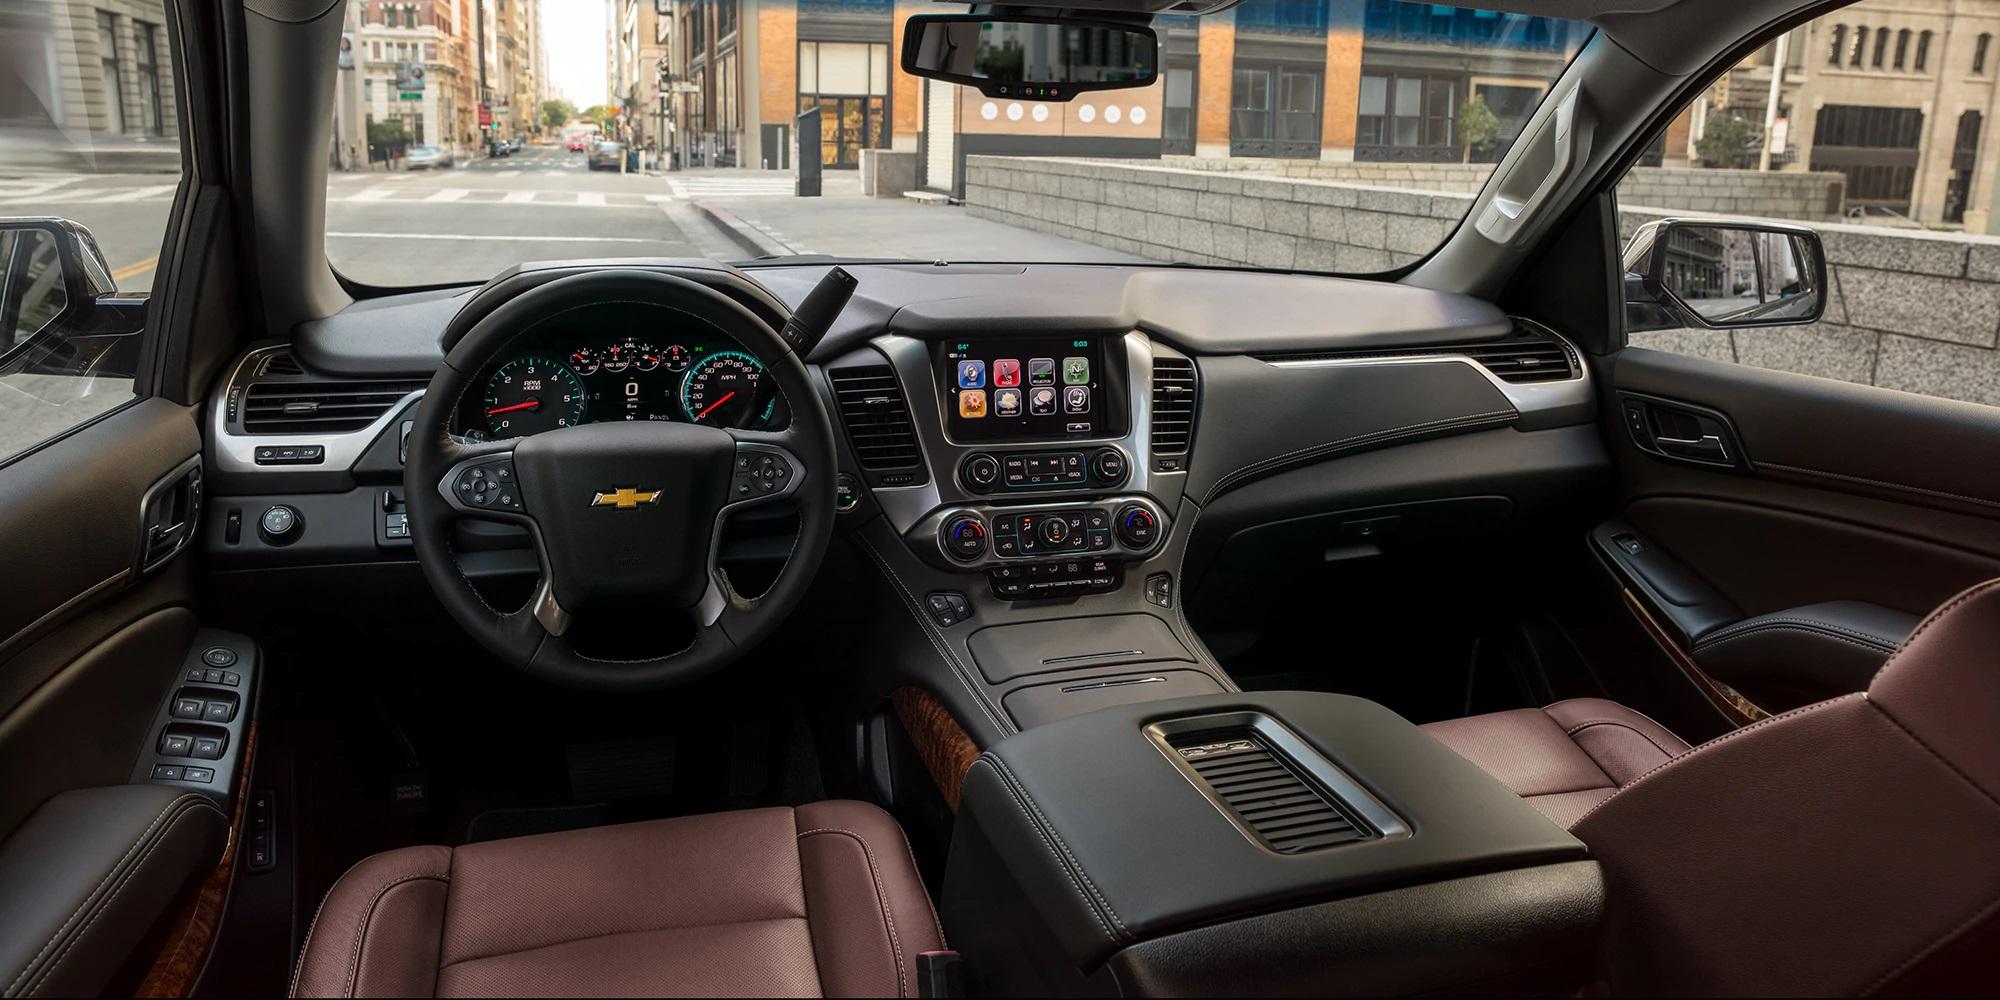 2020 Chevrolet Tahoe Cabin